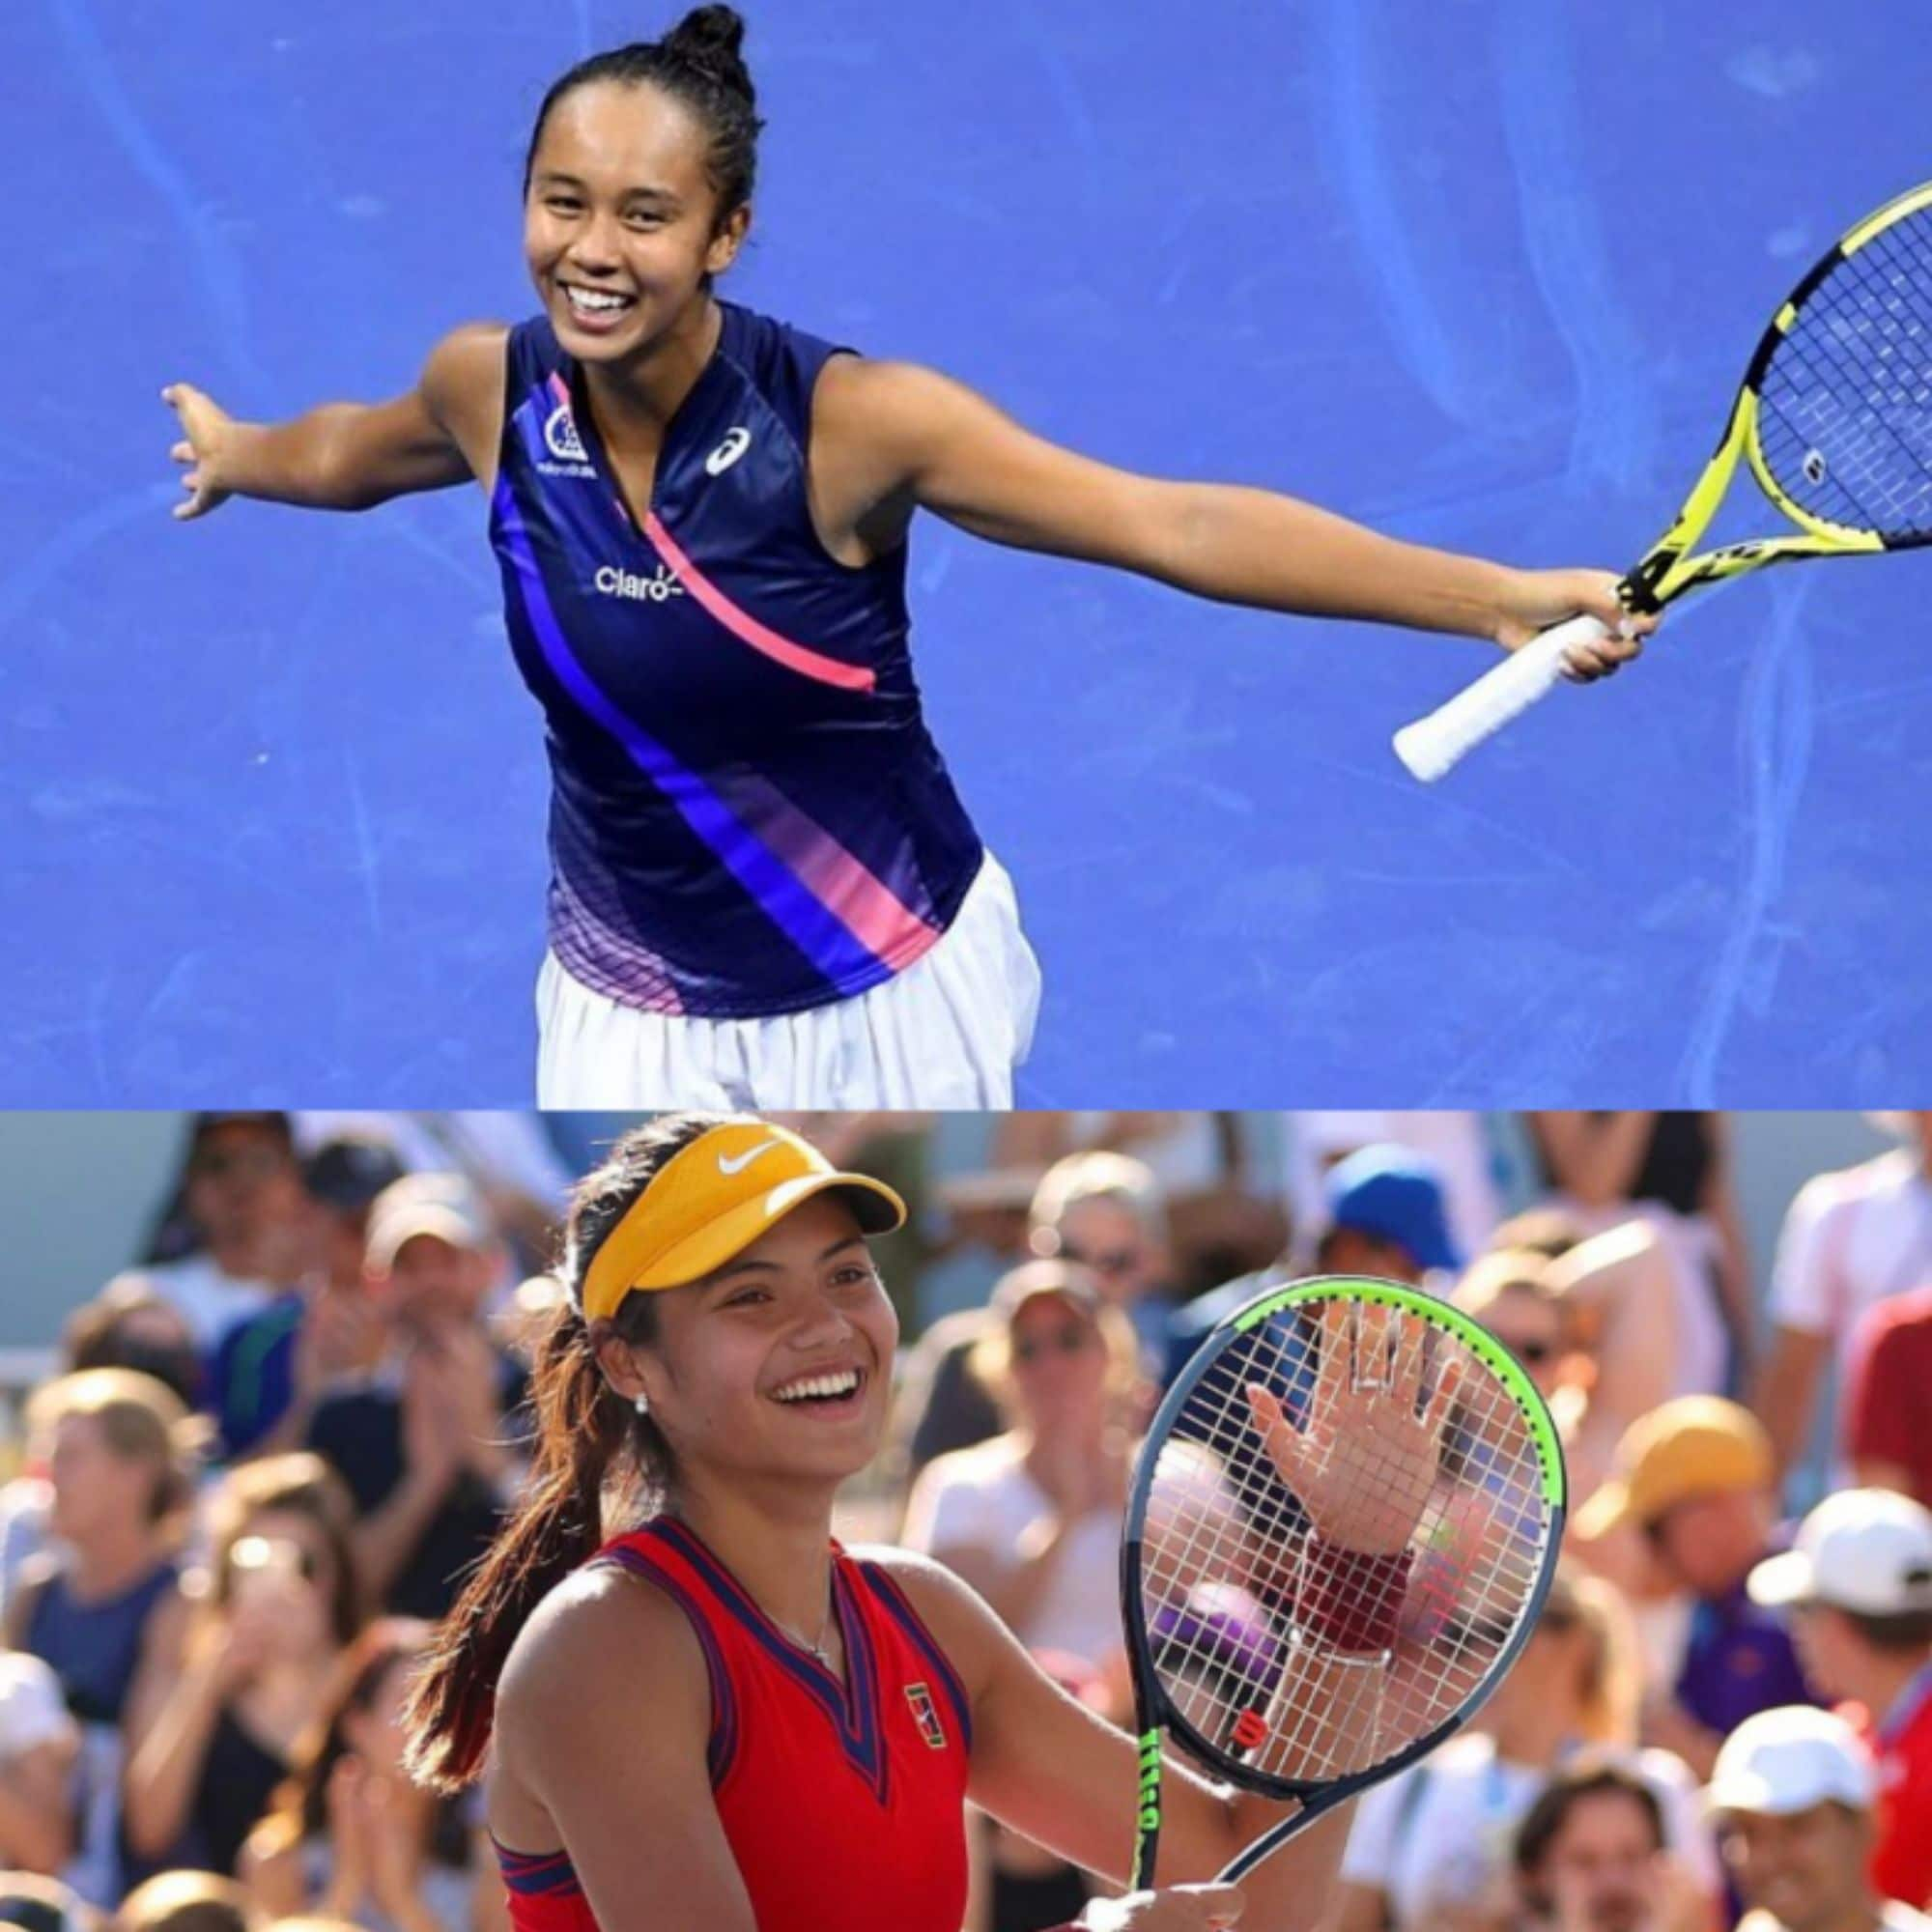 US Open Women's Singles Final: 'Nothing's Impossible' –Fernandez, Ahead Clash With Raducanu